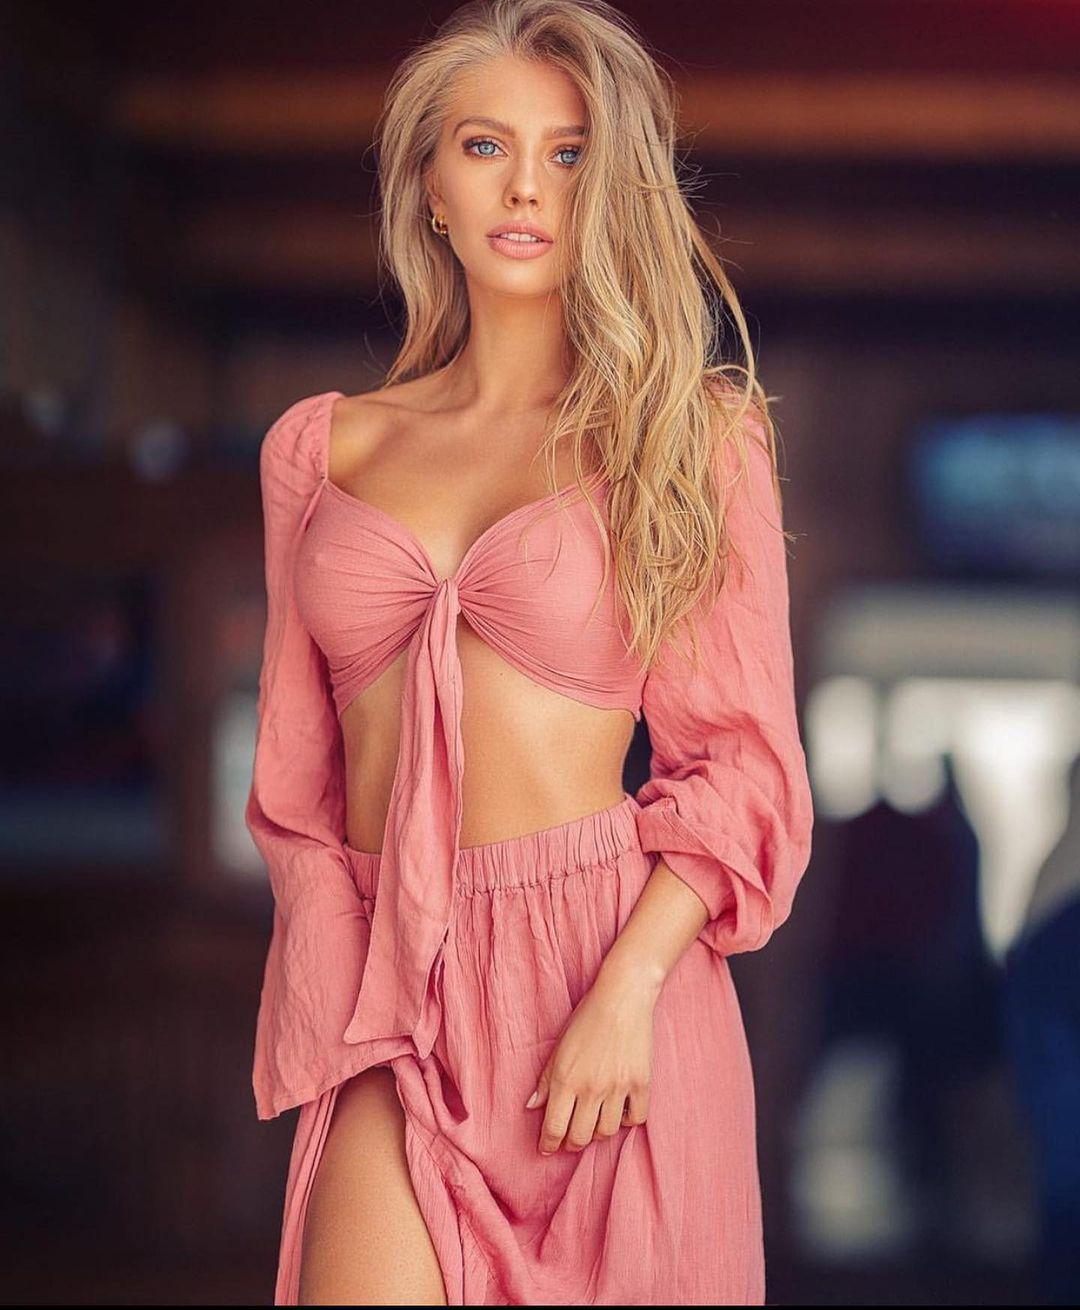 Hot and Stylish Girl DP